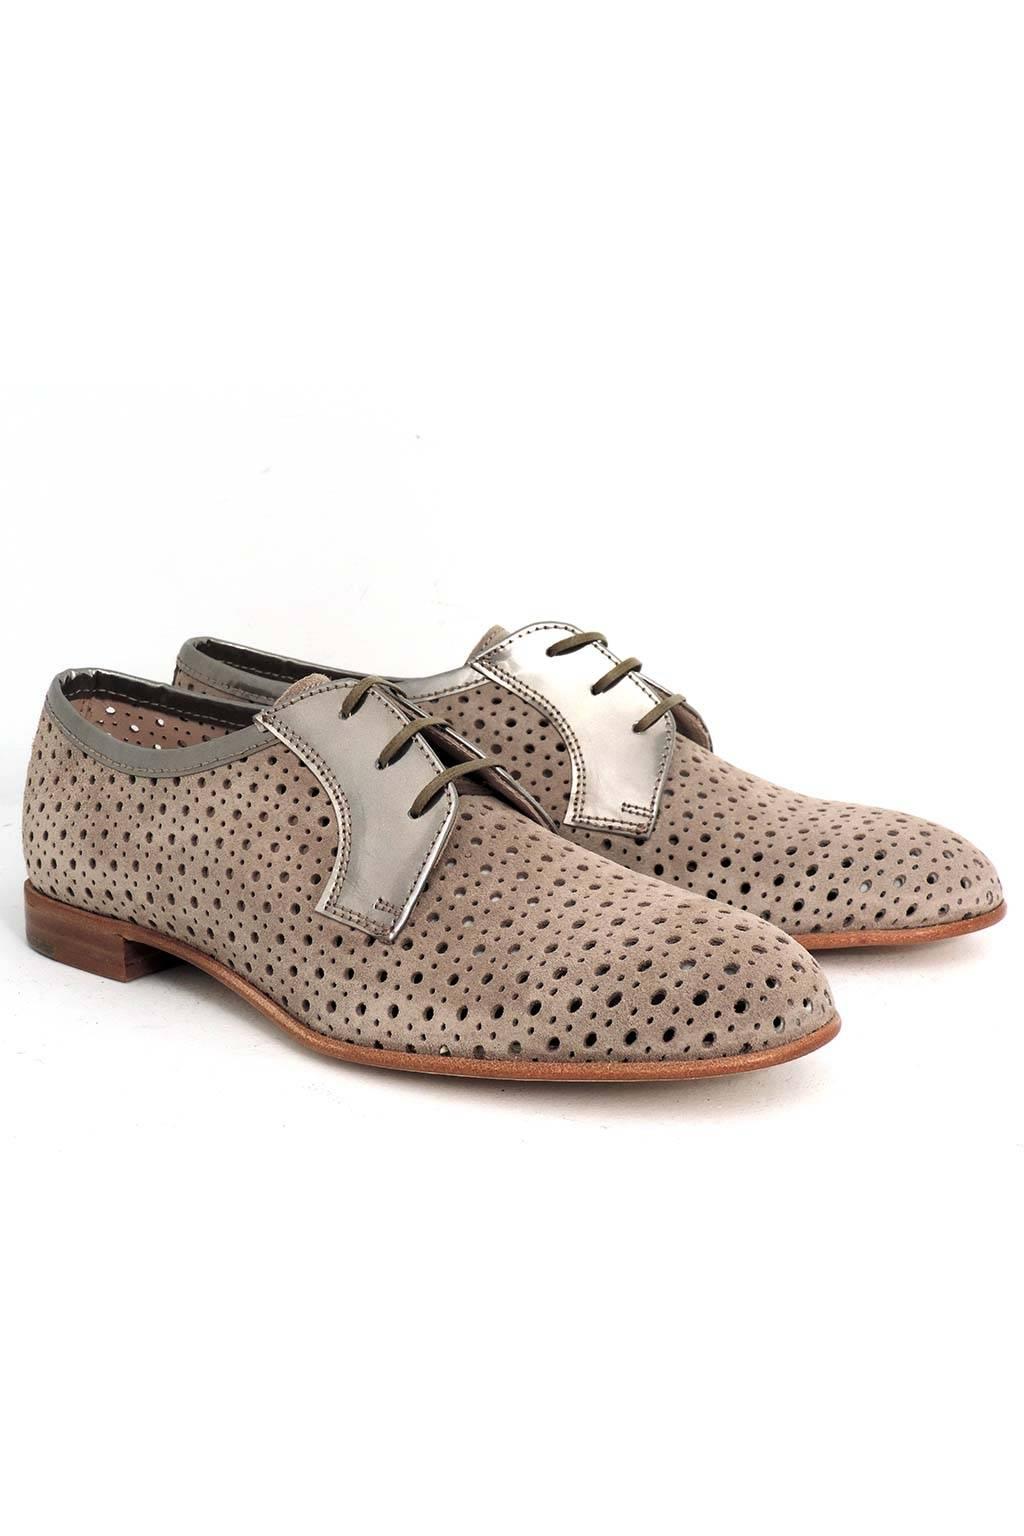 Zapato piel perforado